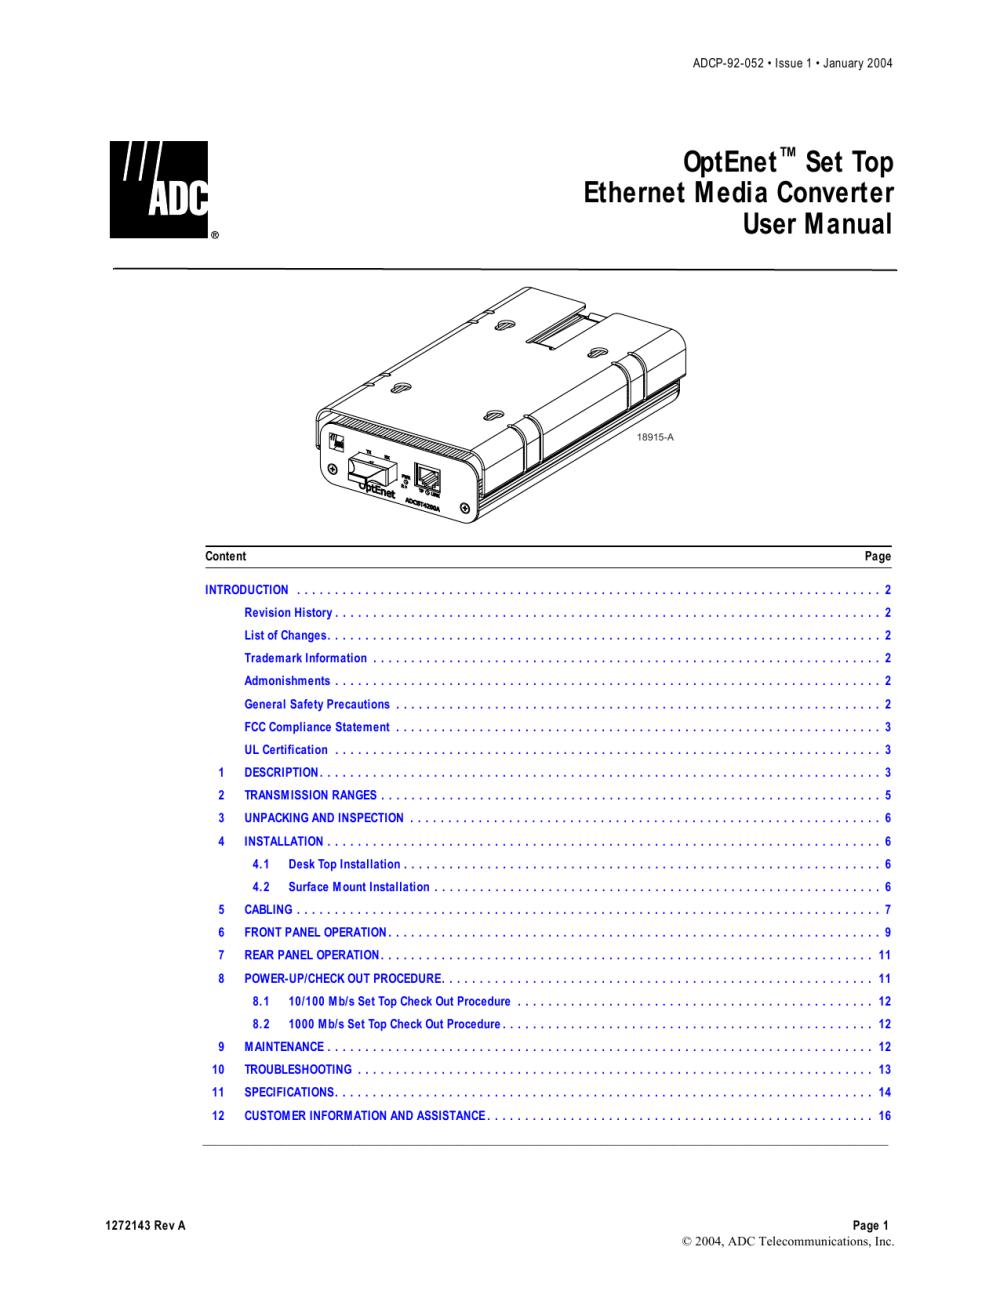 medium resolution of rj45 wiring diagram 100mb schematic diagram 10 100mb rj45 diagram source ethernet 10 100